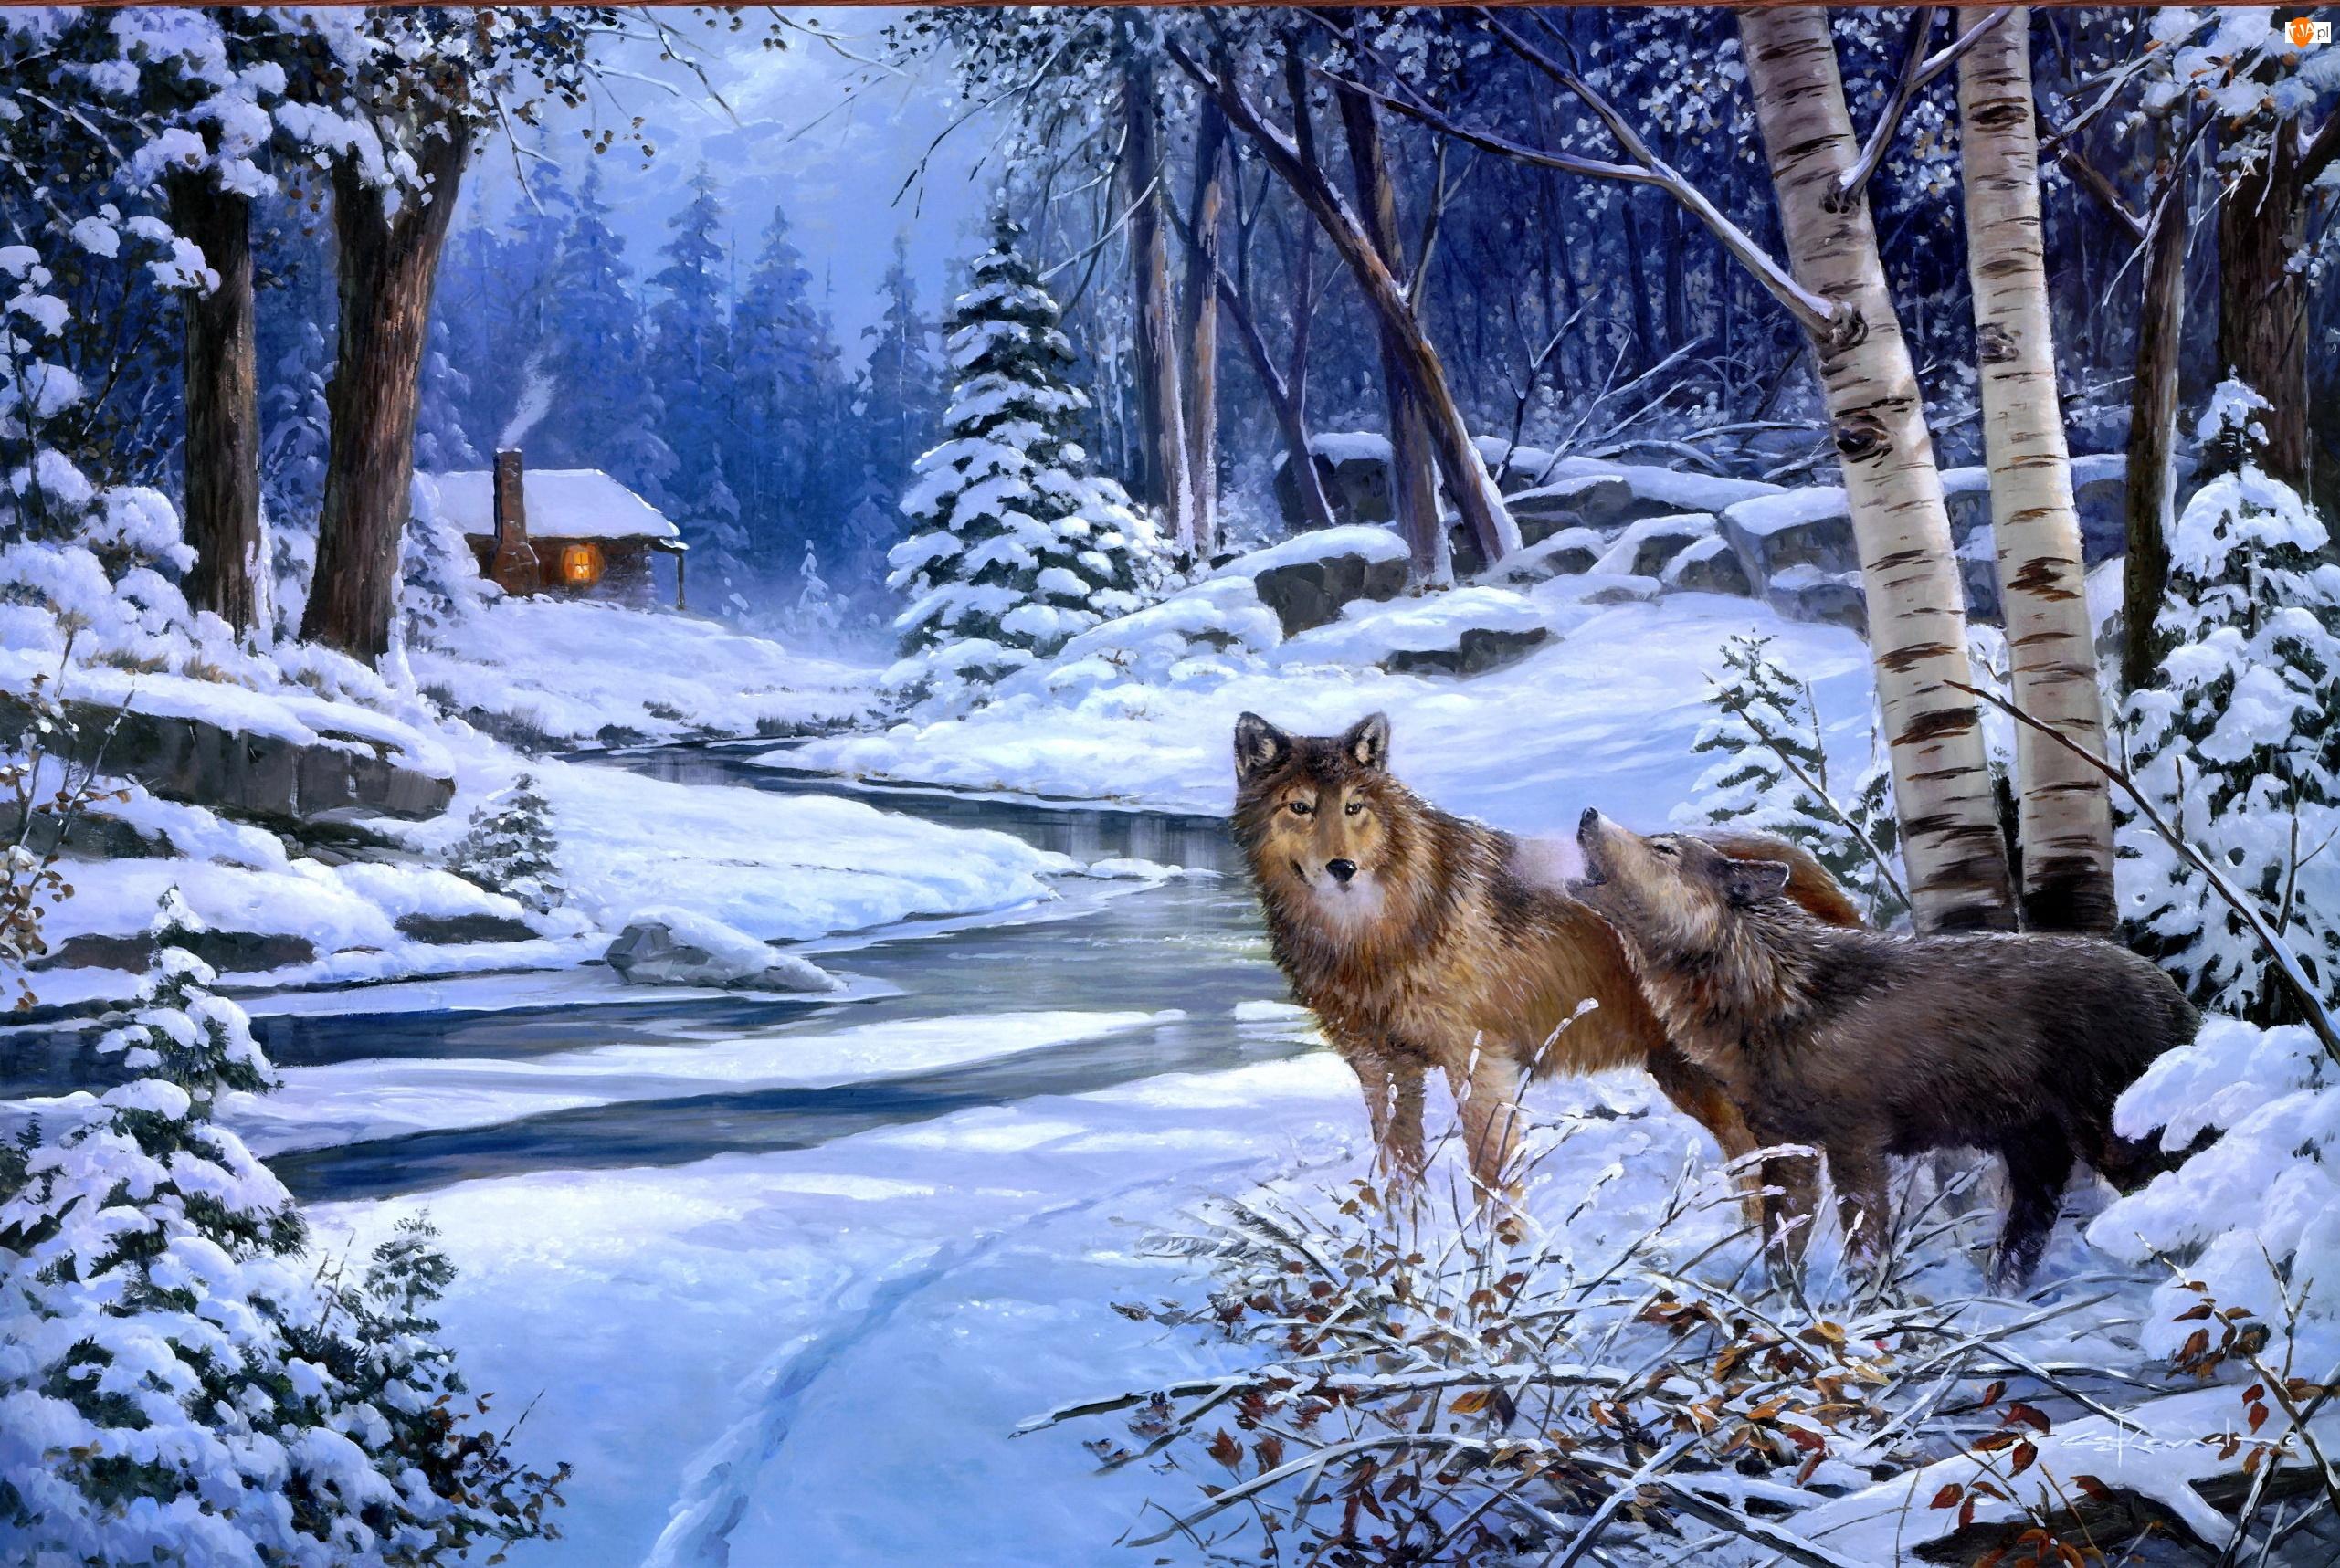 Malarstwo, Wilki, Zima